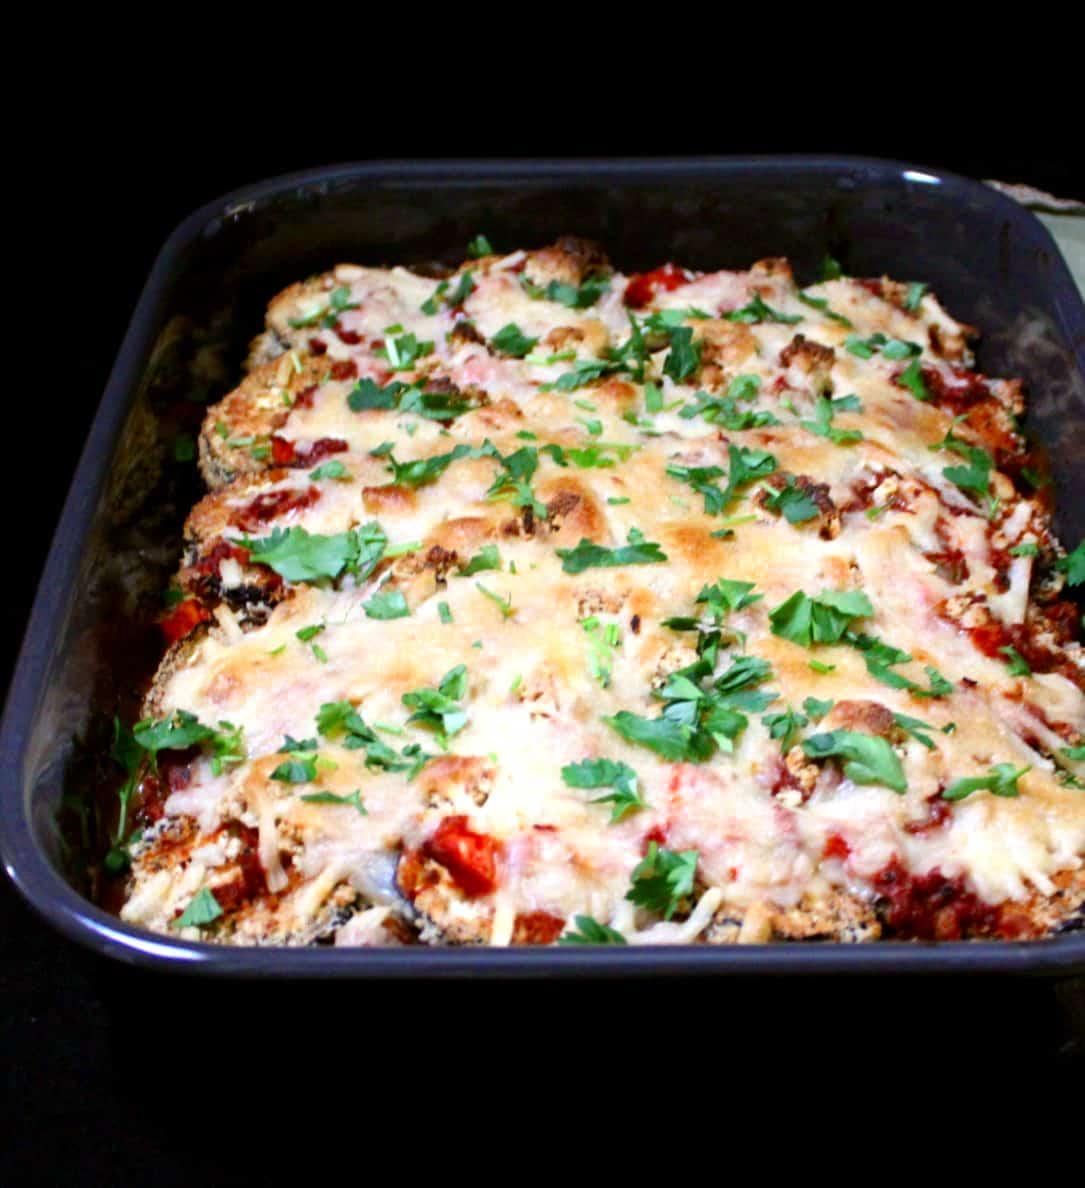 Vegan Eggplant Parmesan recipe